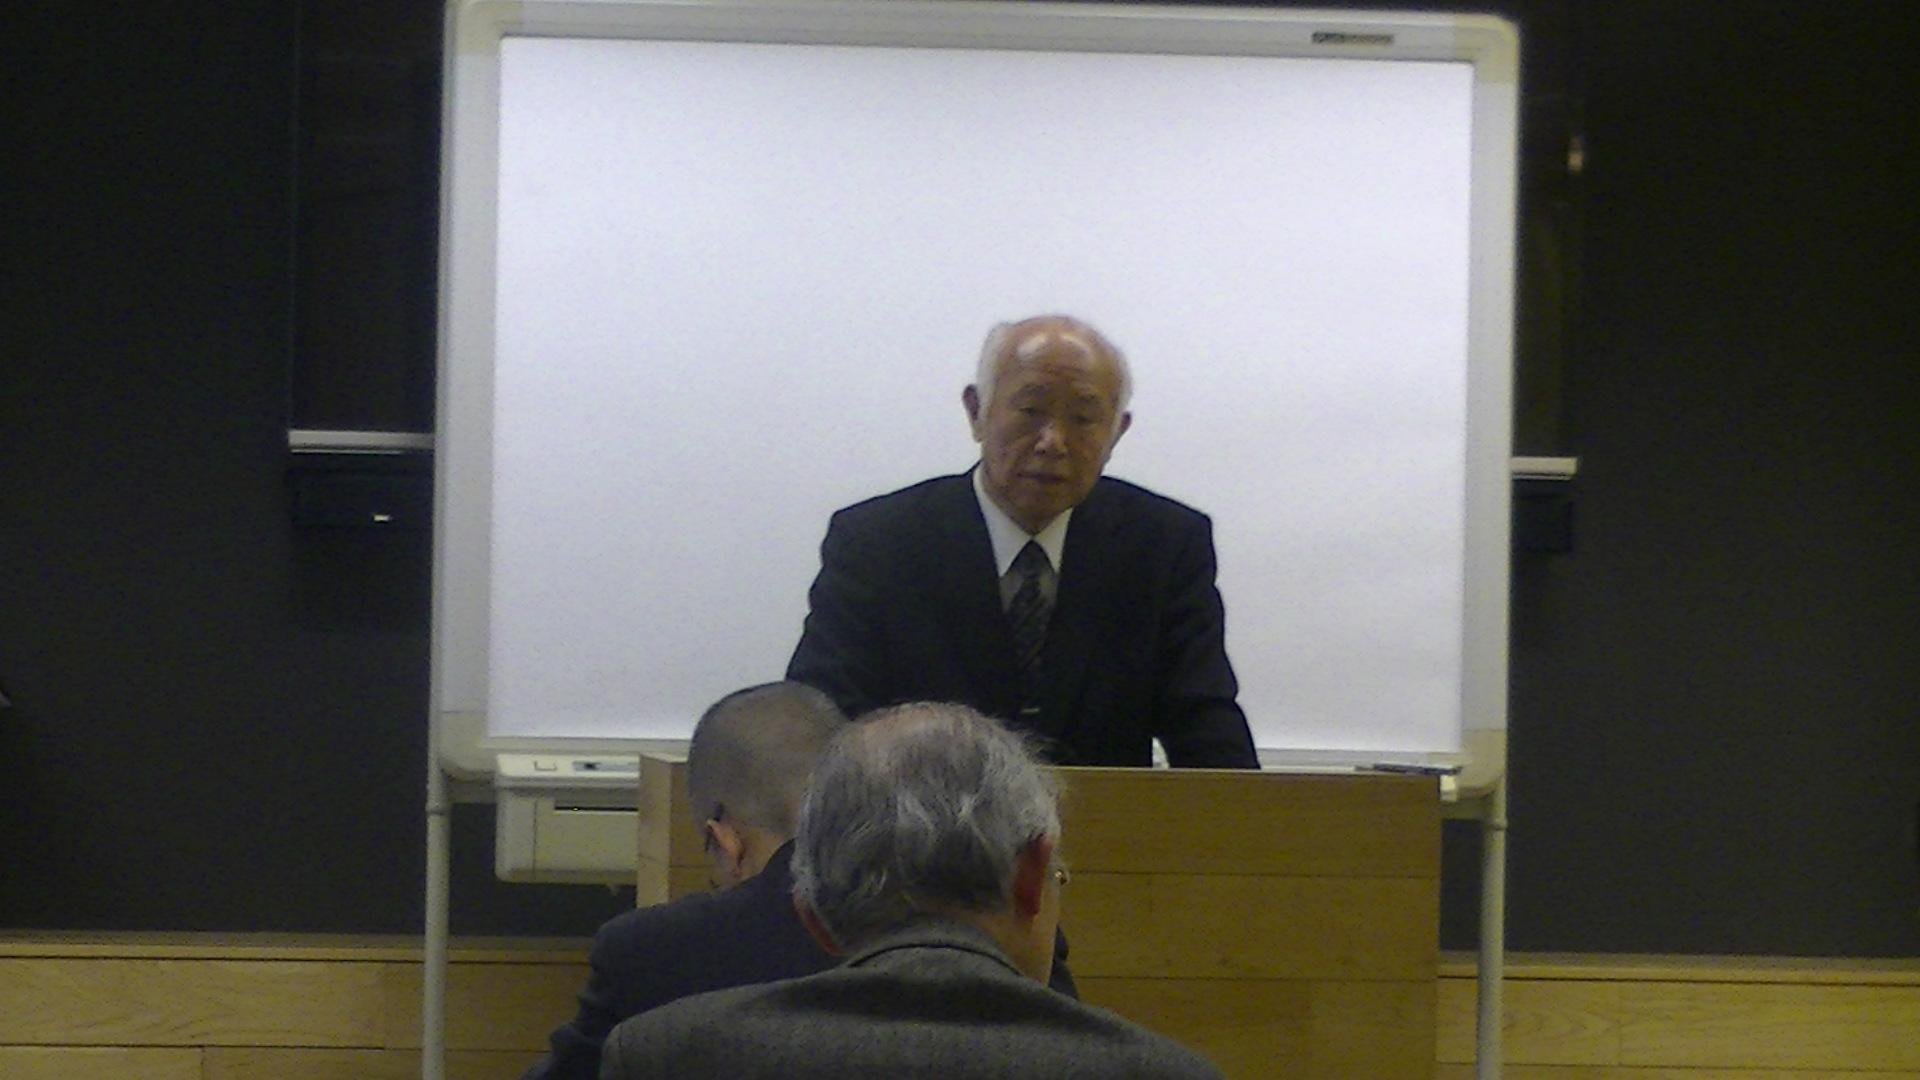 PIC 0090 - 4月1日東京思風塾の開催になります。